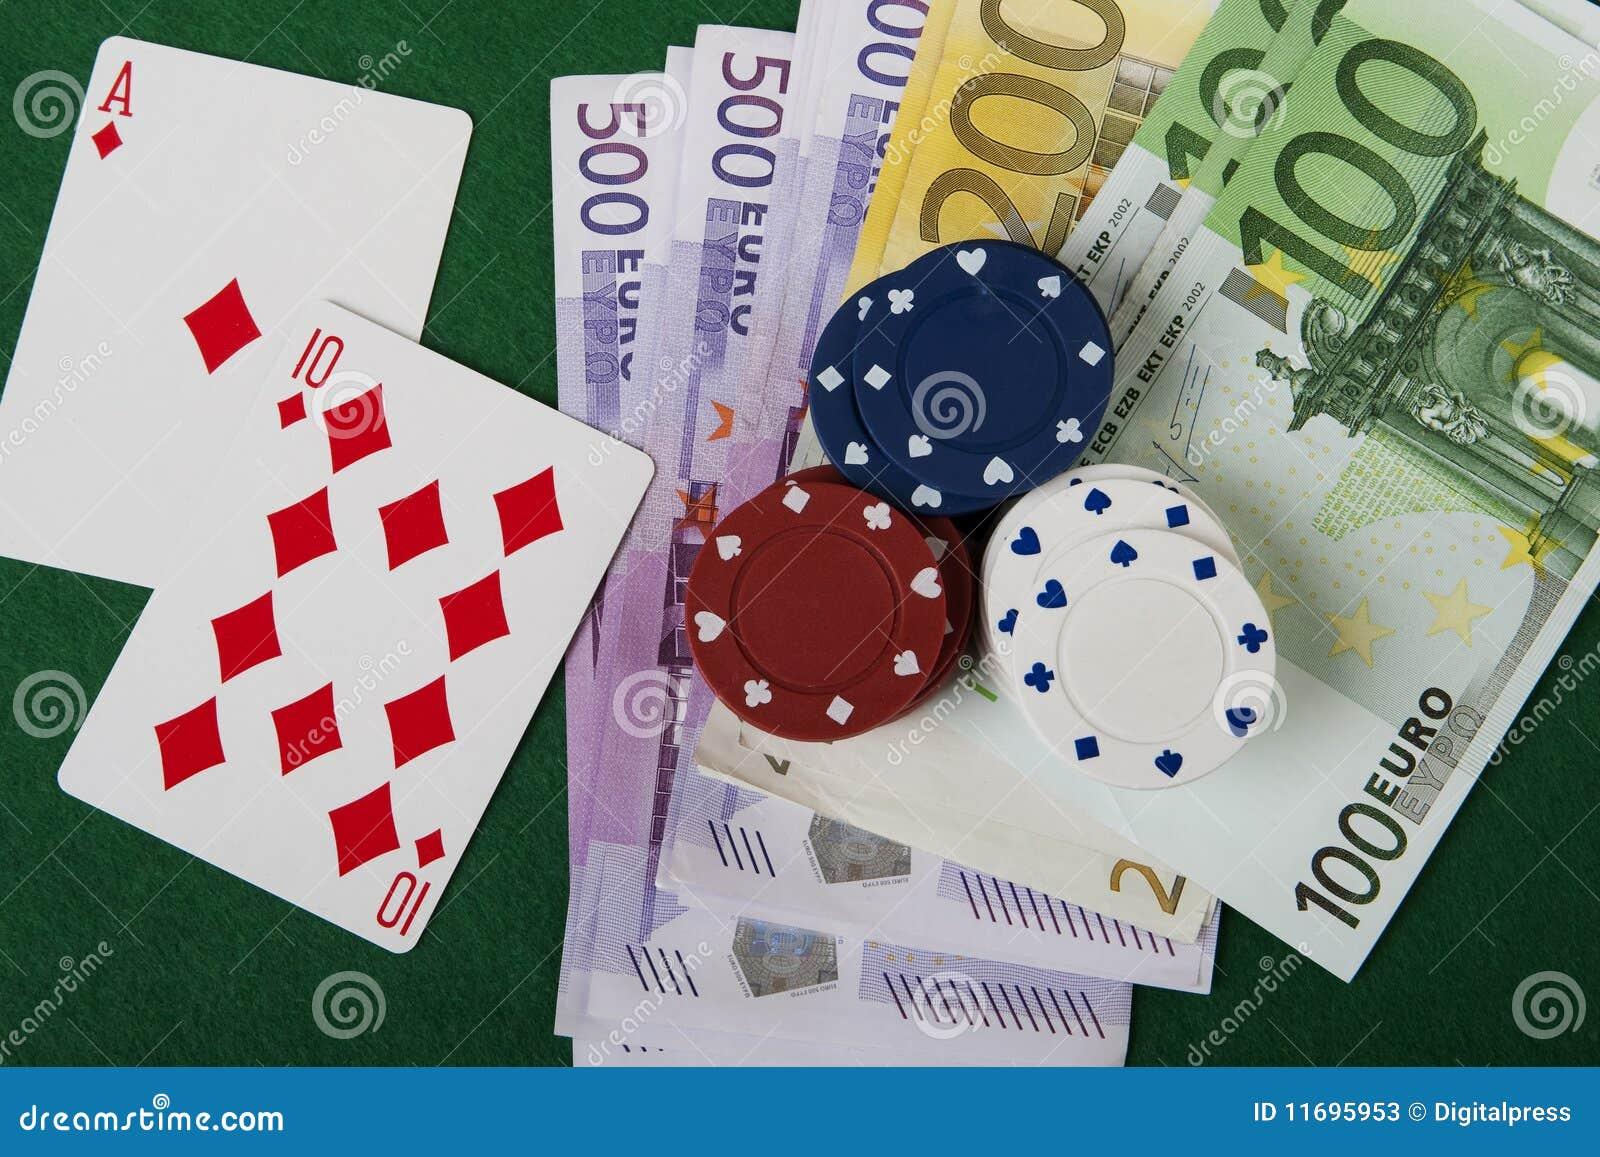 Black Jack Card Game 41